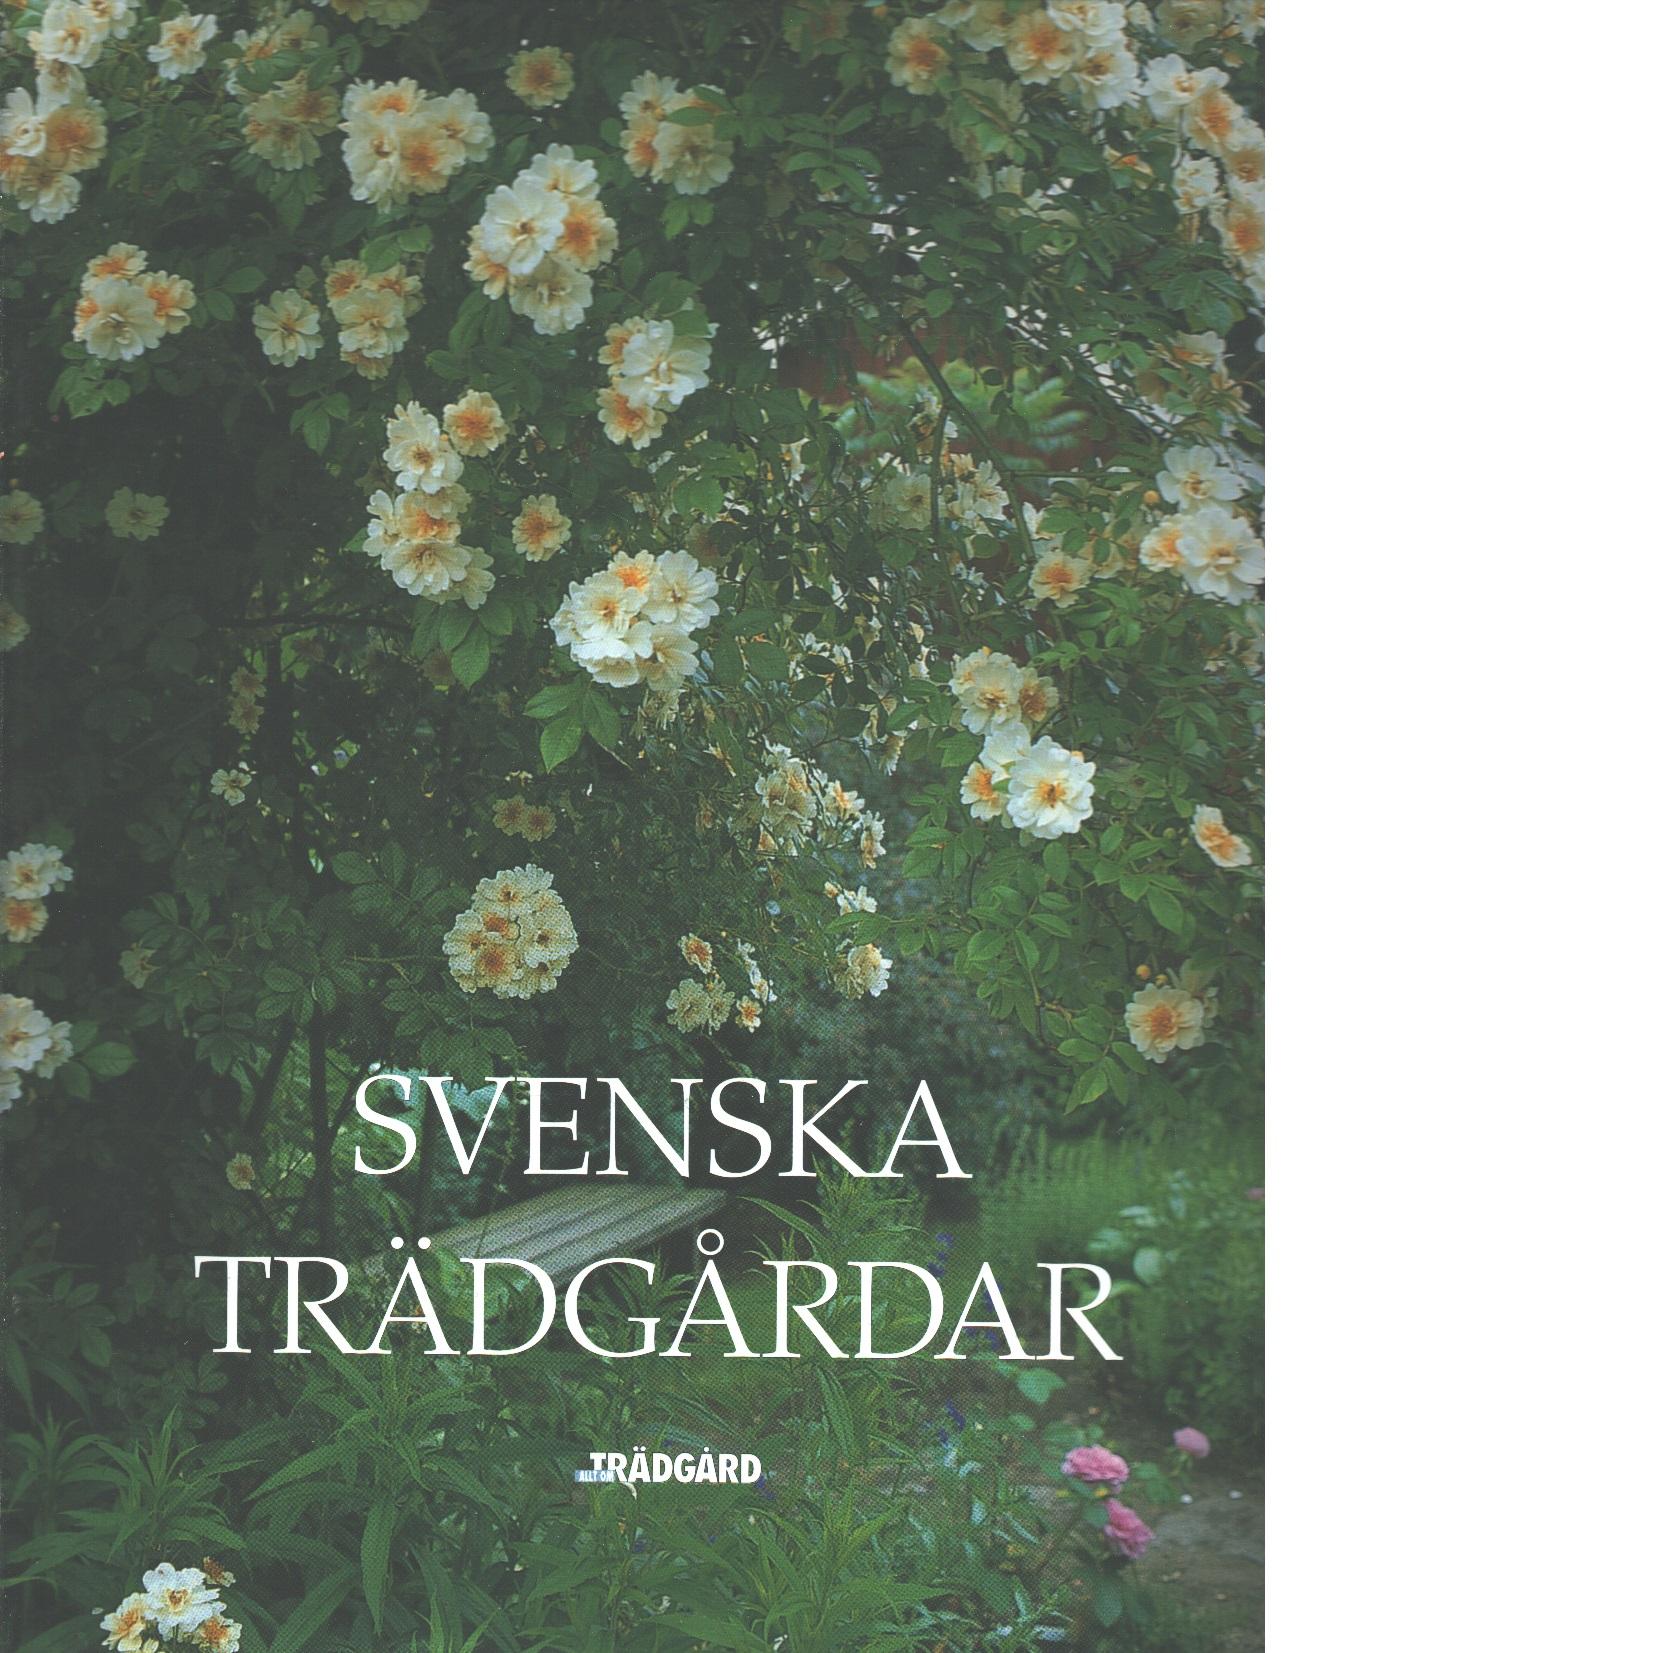 Svenska trädgårdar - Andersson, Lena Sofia